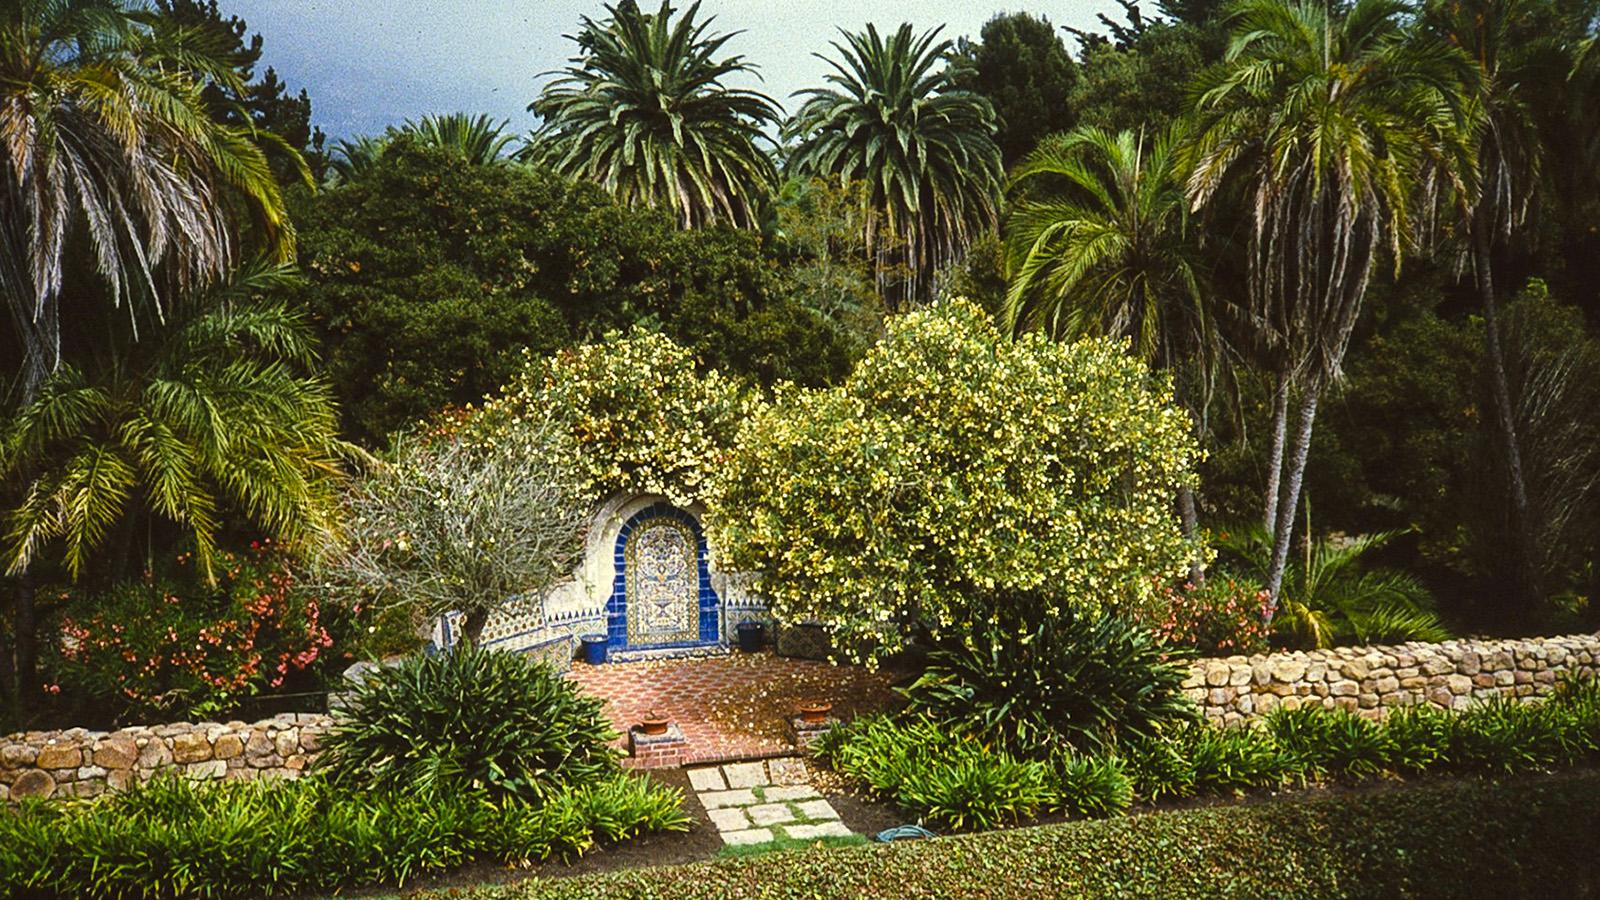 CA_Montecito_CasaDelHerrero_06_CharlesBirnbaum_1995_Signature.jpg